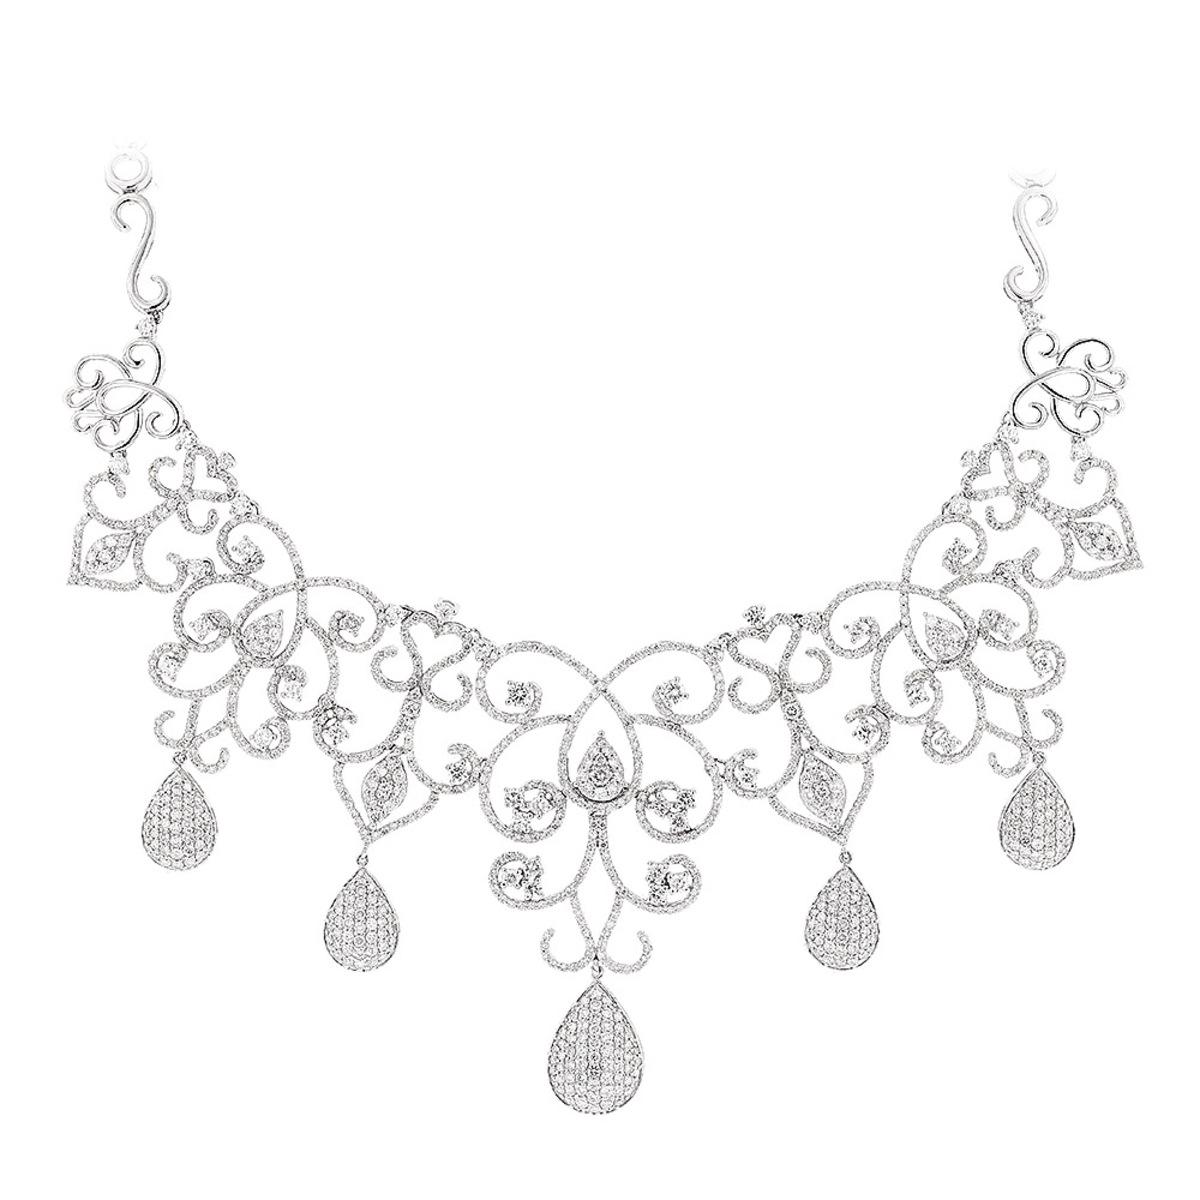 Designer ladies diamond necklaces chandelier necklace by luccello designer ladies diamond necklaces chandelier necklace by luccello 18k gold aloadofball Choice Image